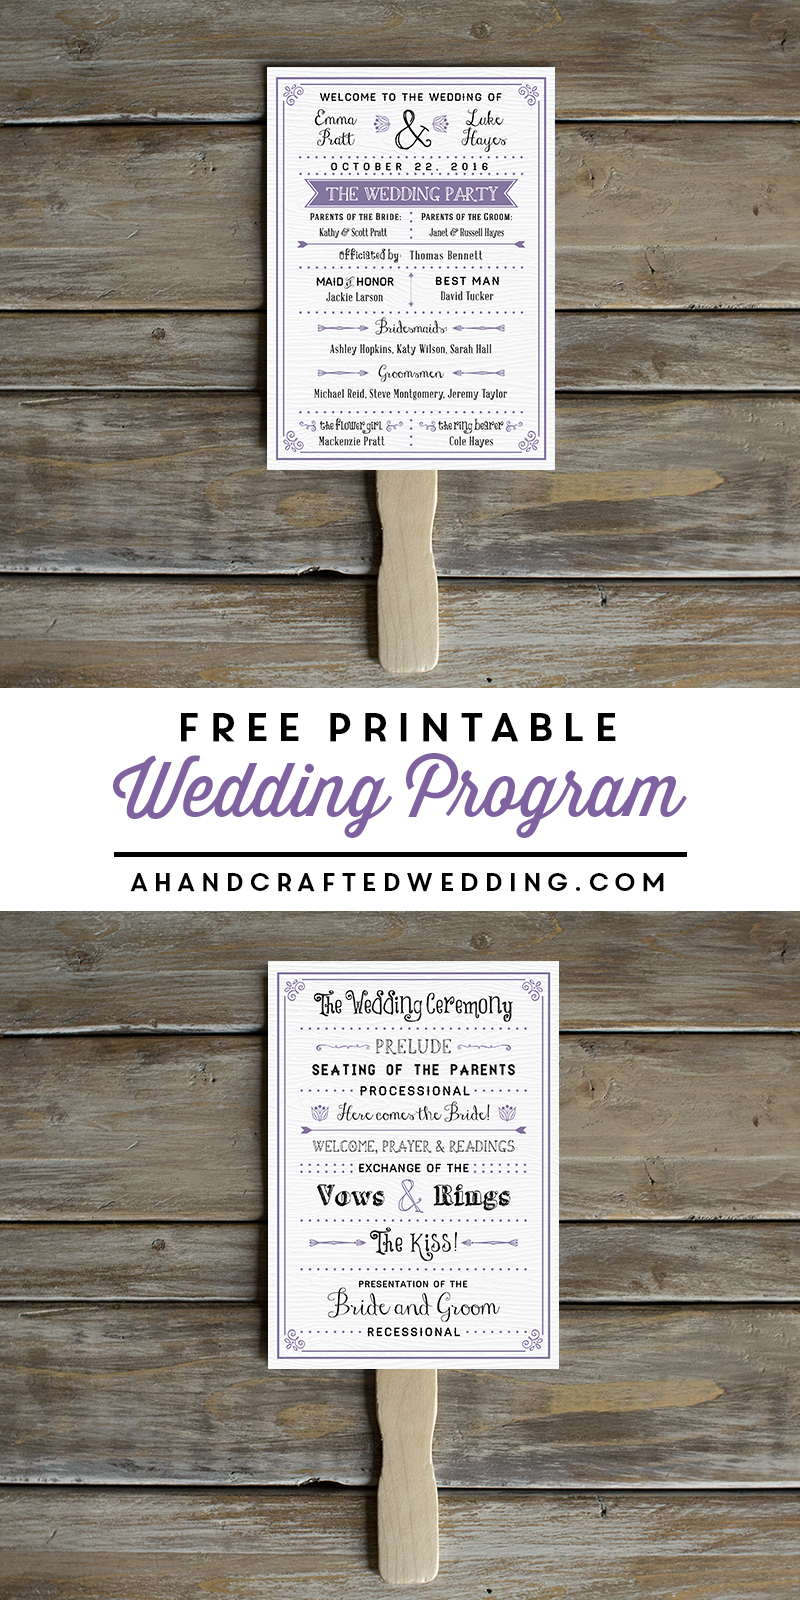 Free Printable Wedding Program | Crafty 2 The Core~Diy Galore - Free Printable Fan Wedding Programs